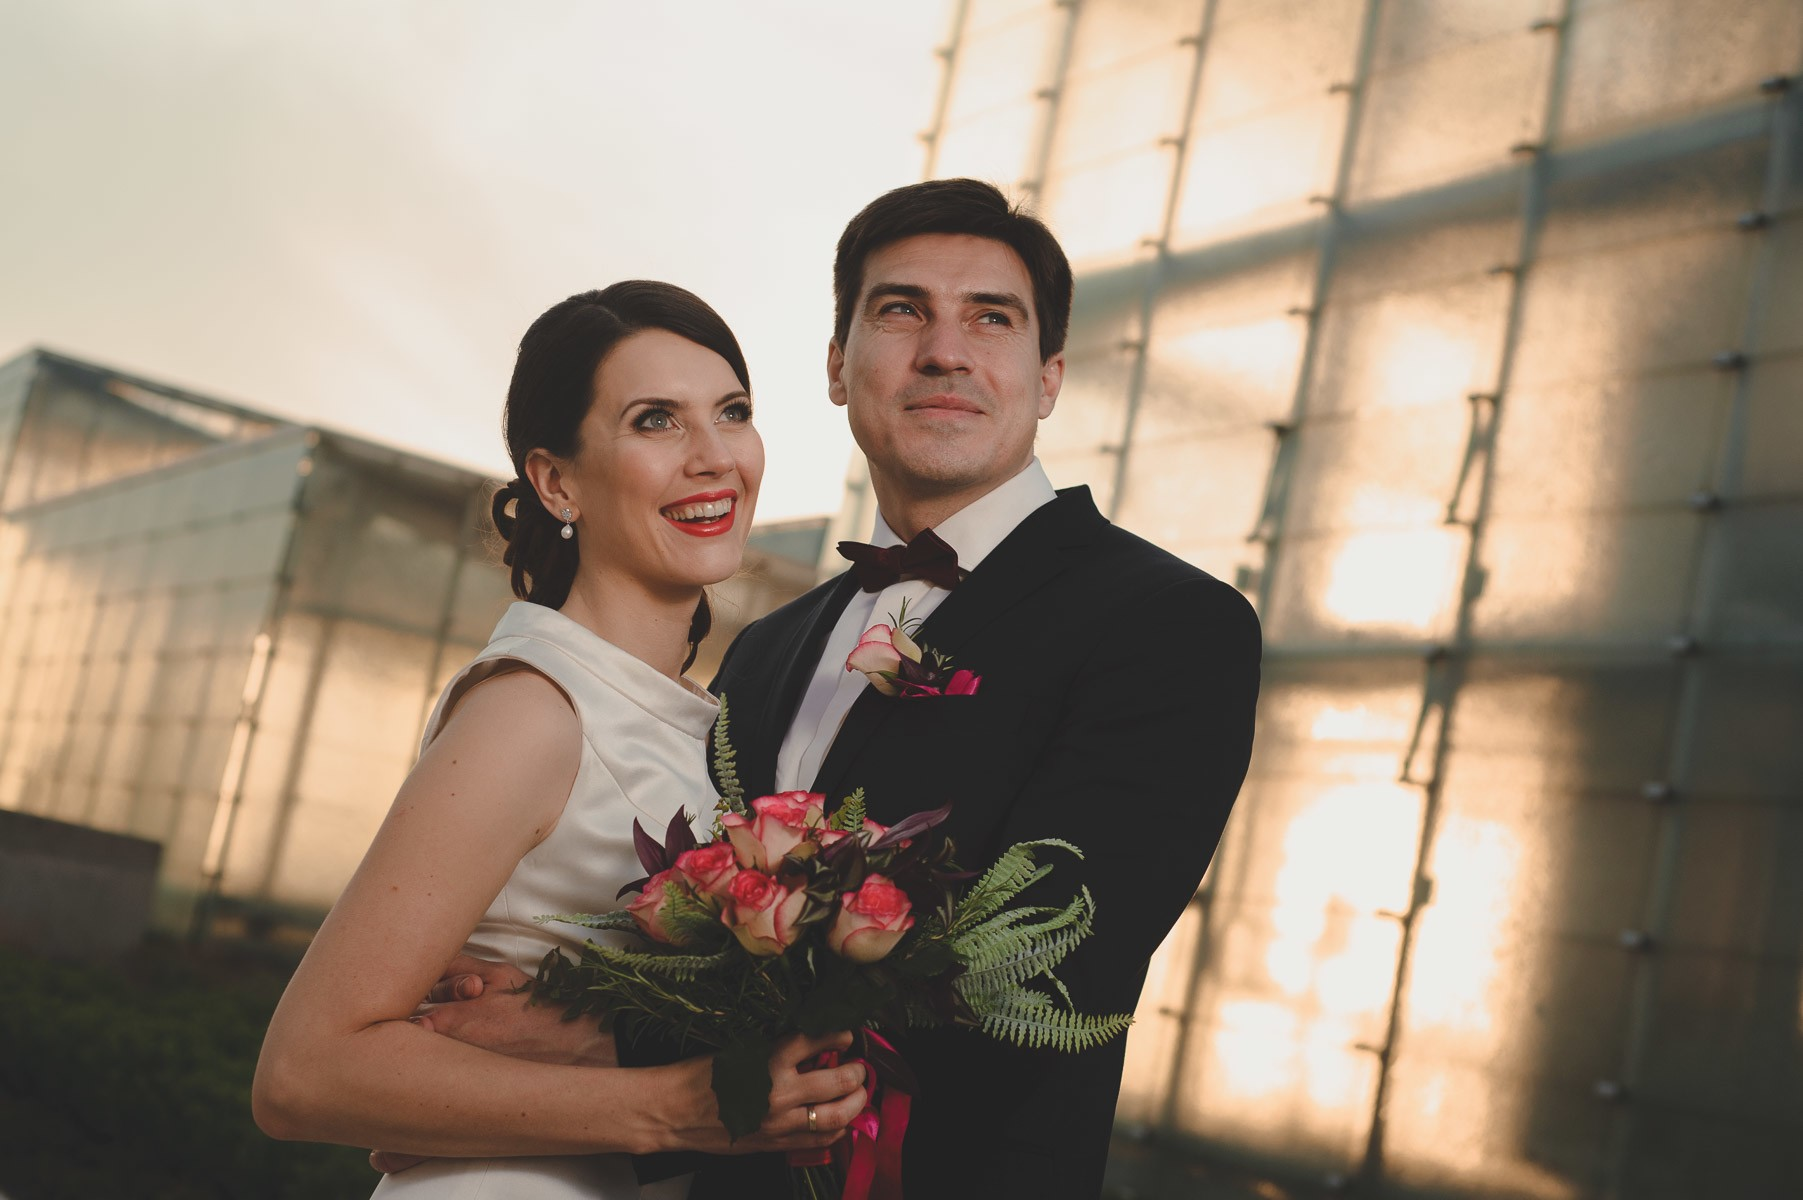 fotograf ślubny na Śląsku